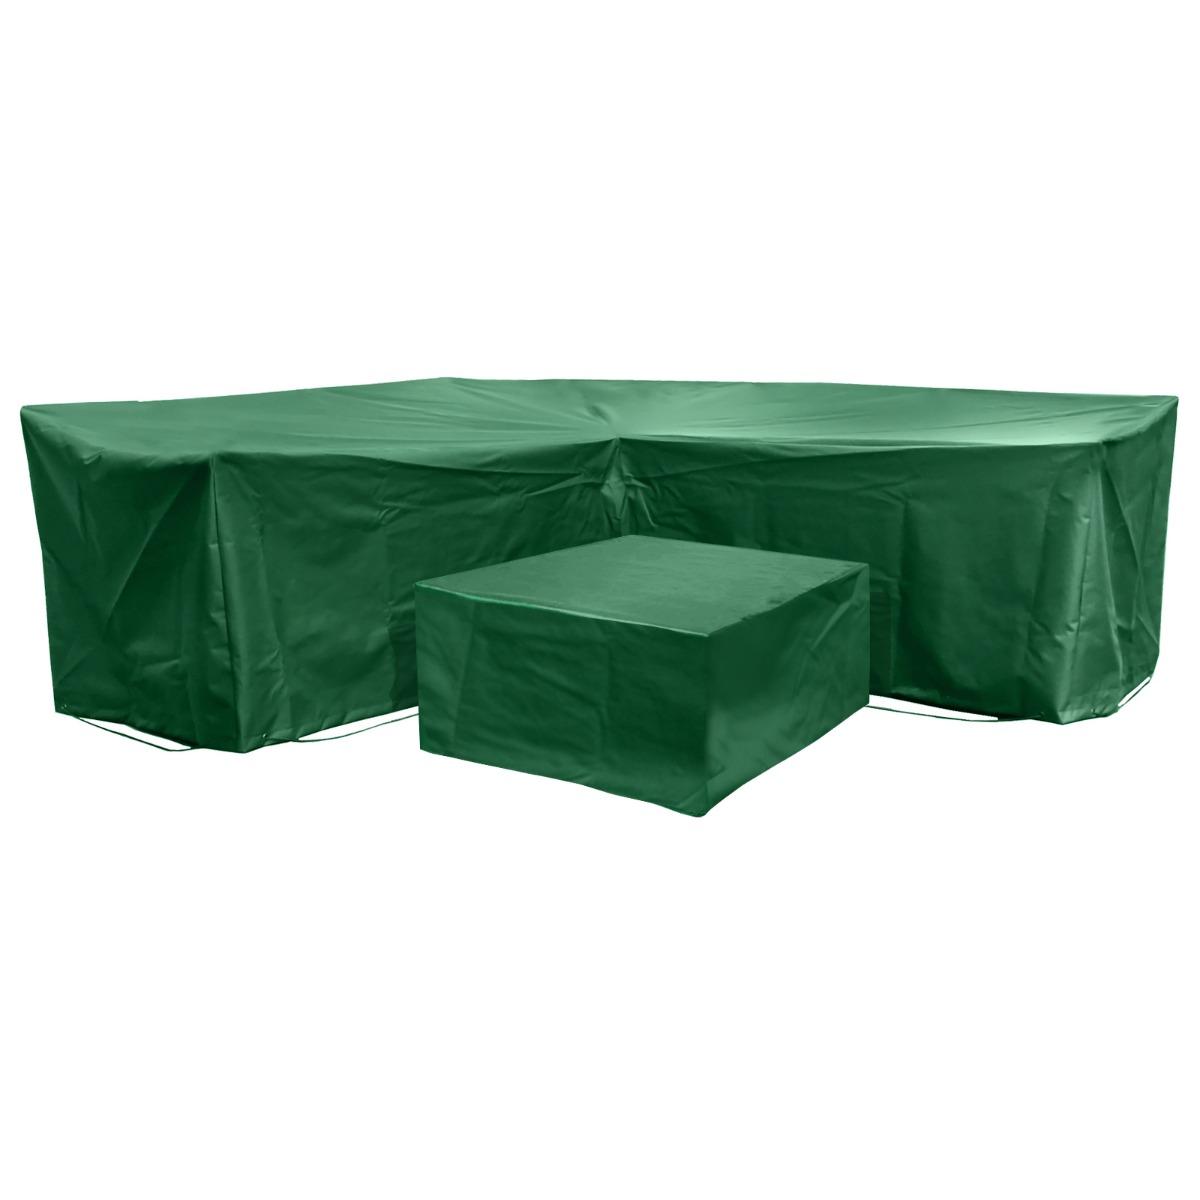 Acorn Corner L Shape Dining Cover Set in Green